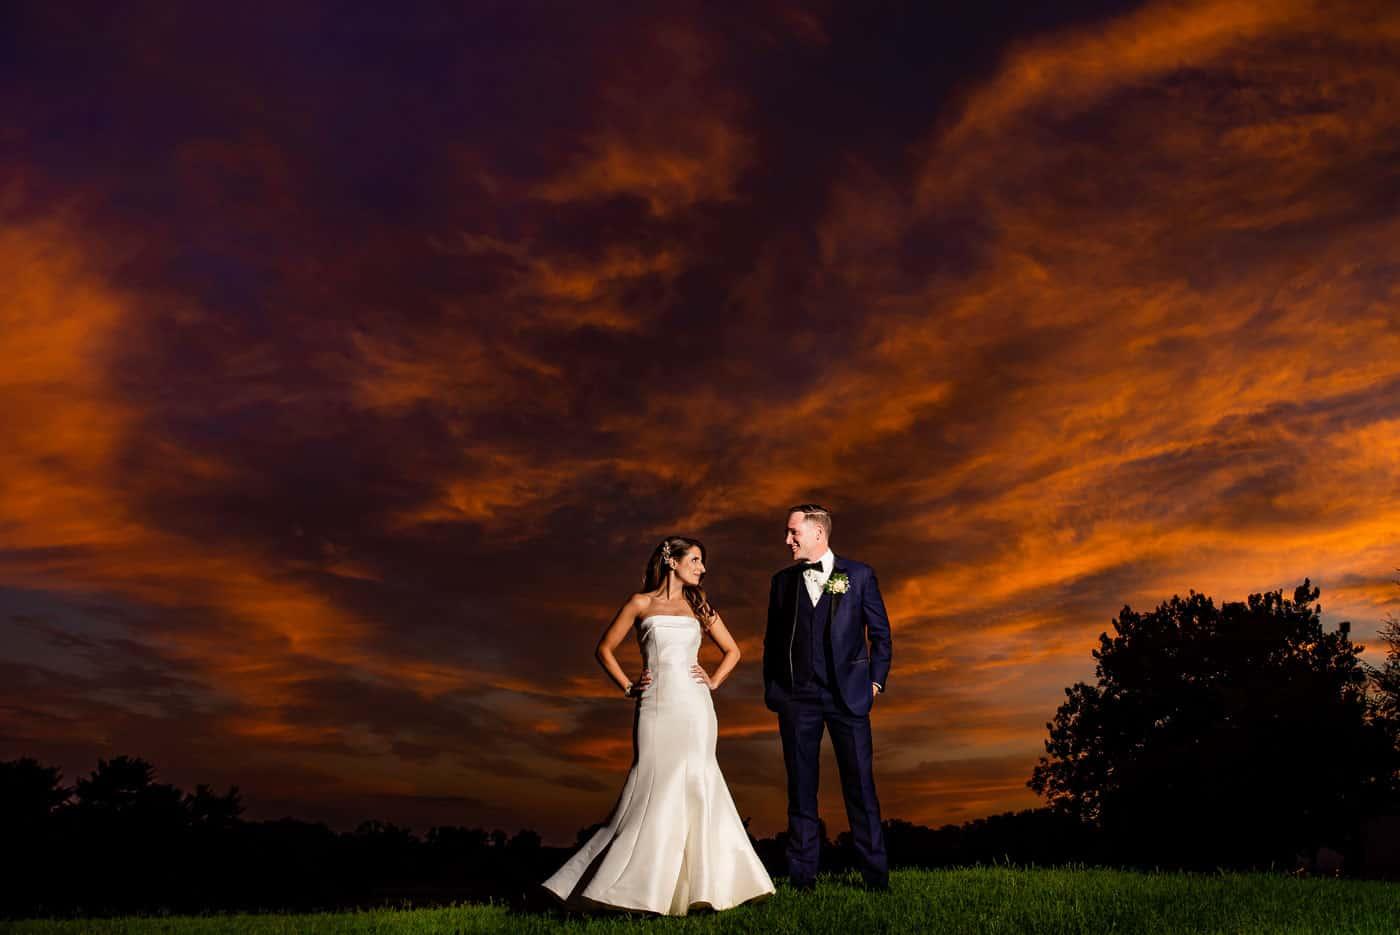 Springfield Country Club Outdoor wedding